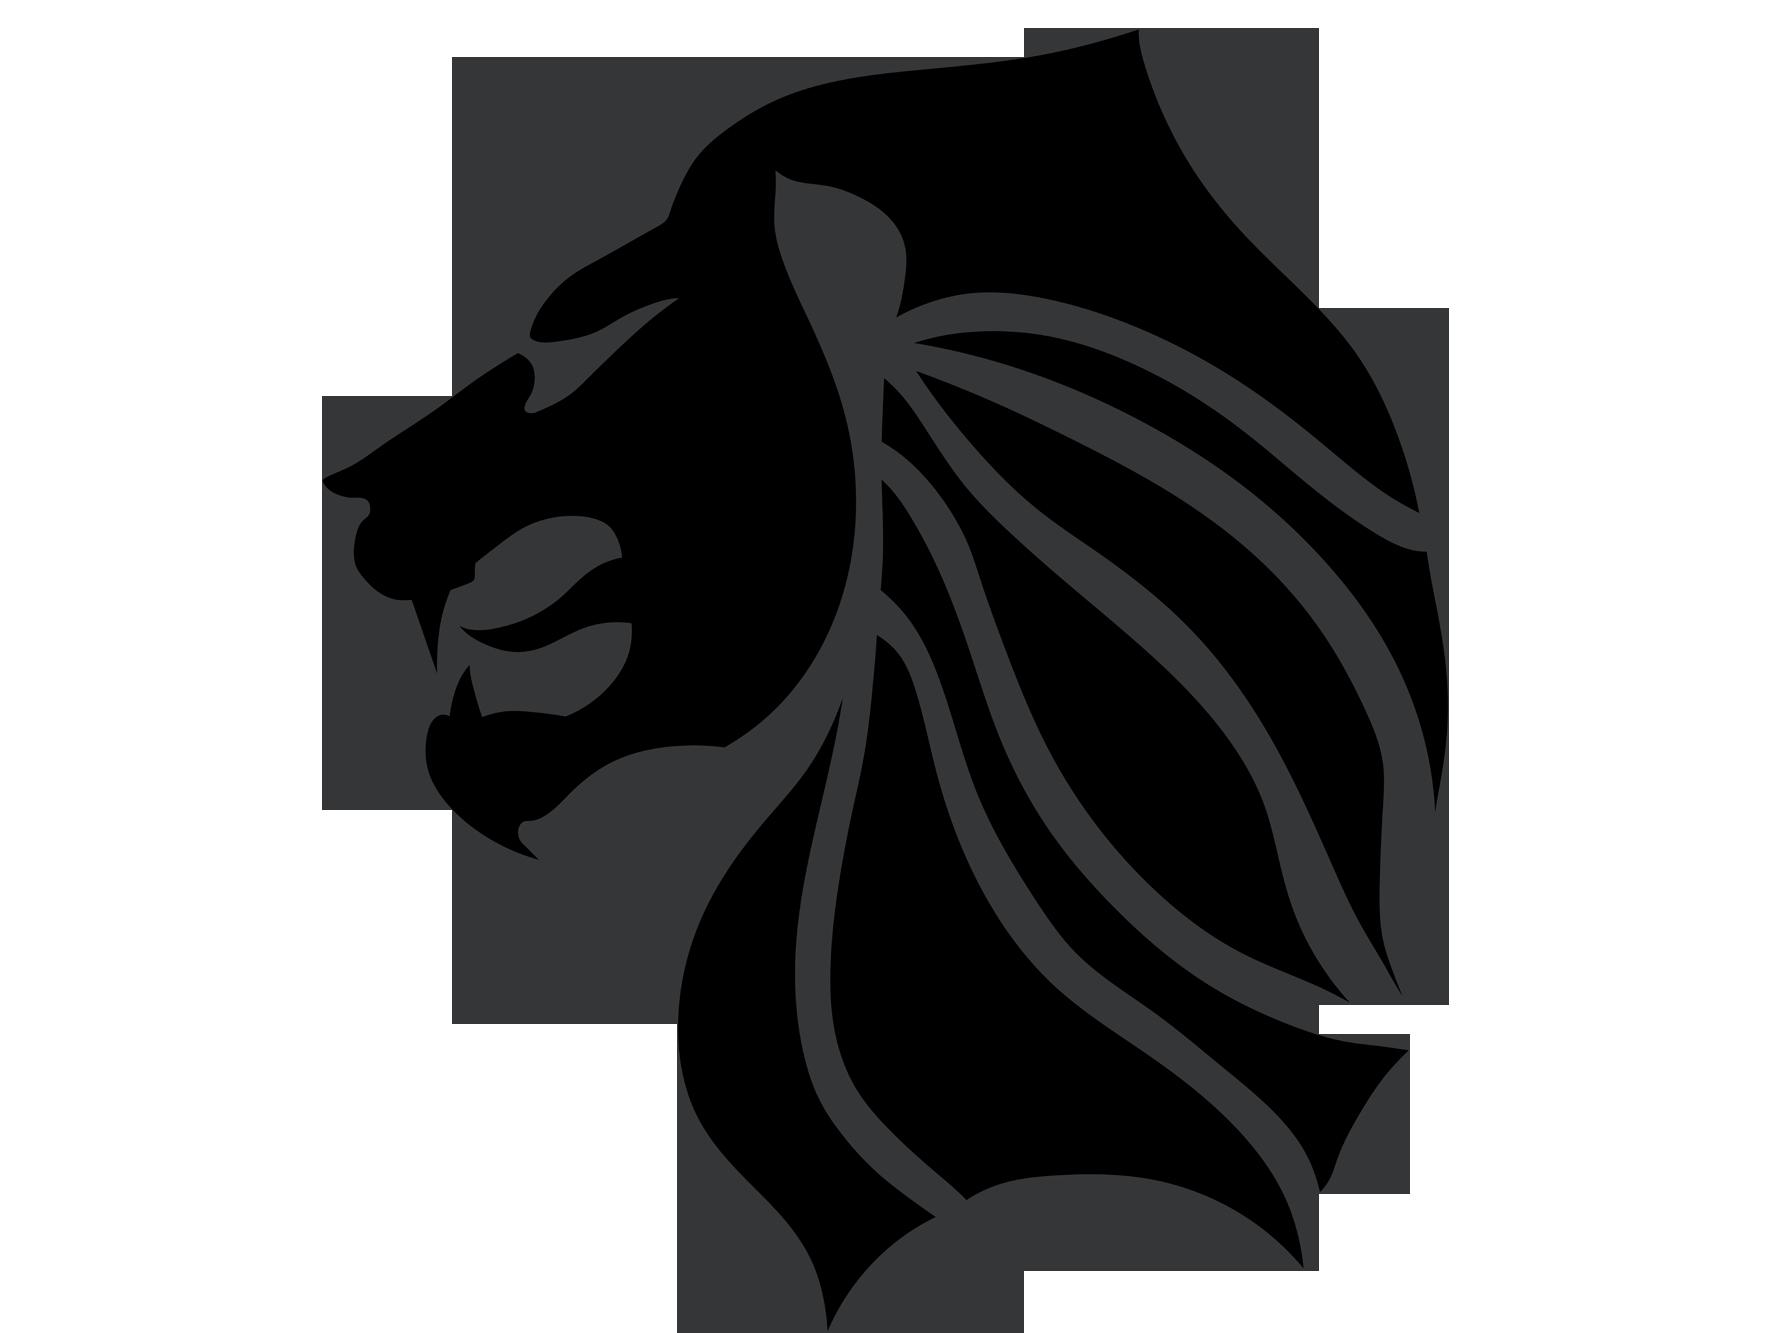 Lionheart logo cut MIRROR.png